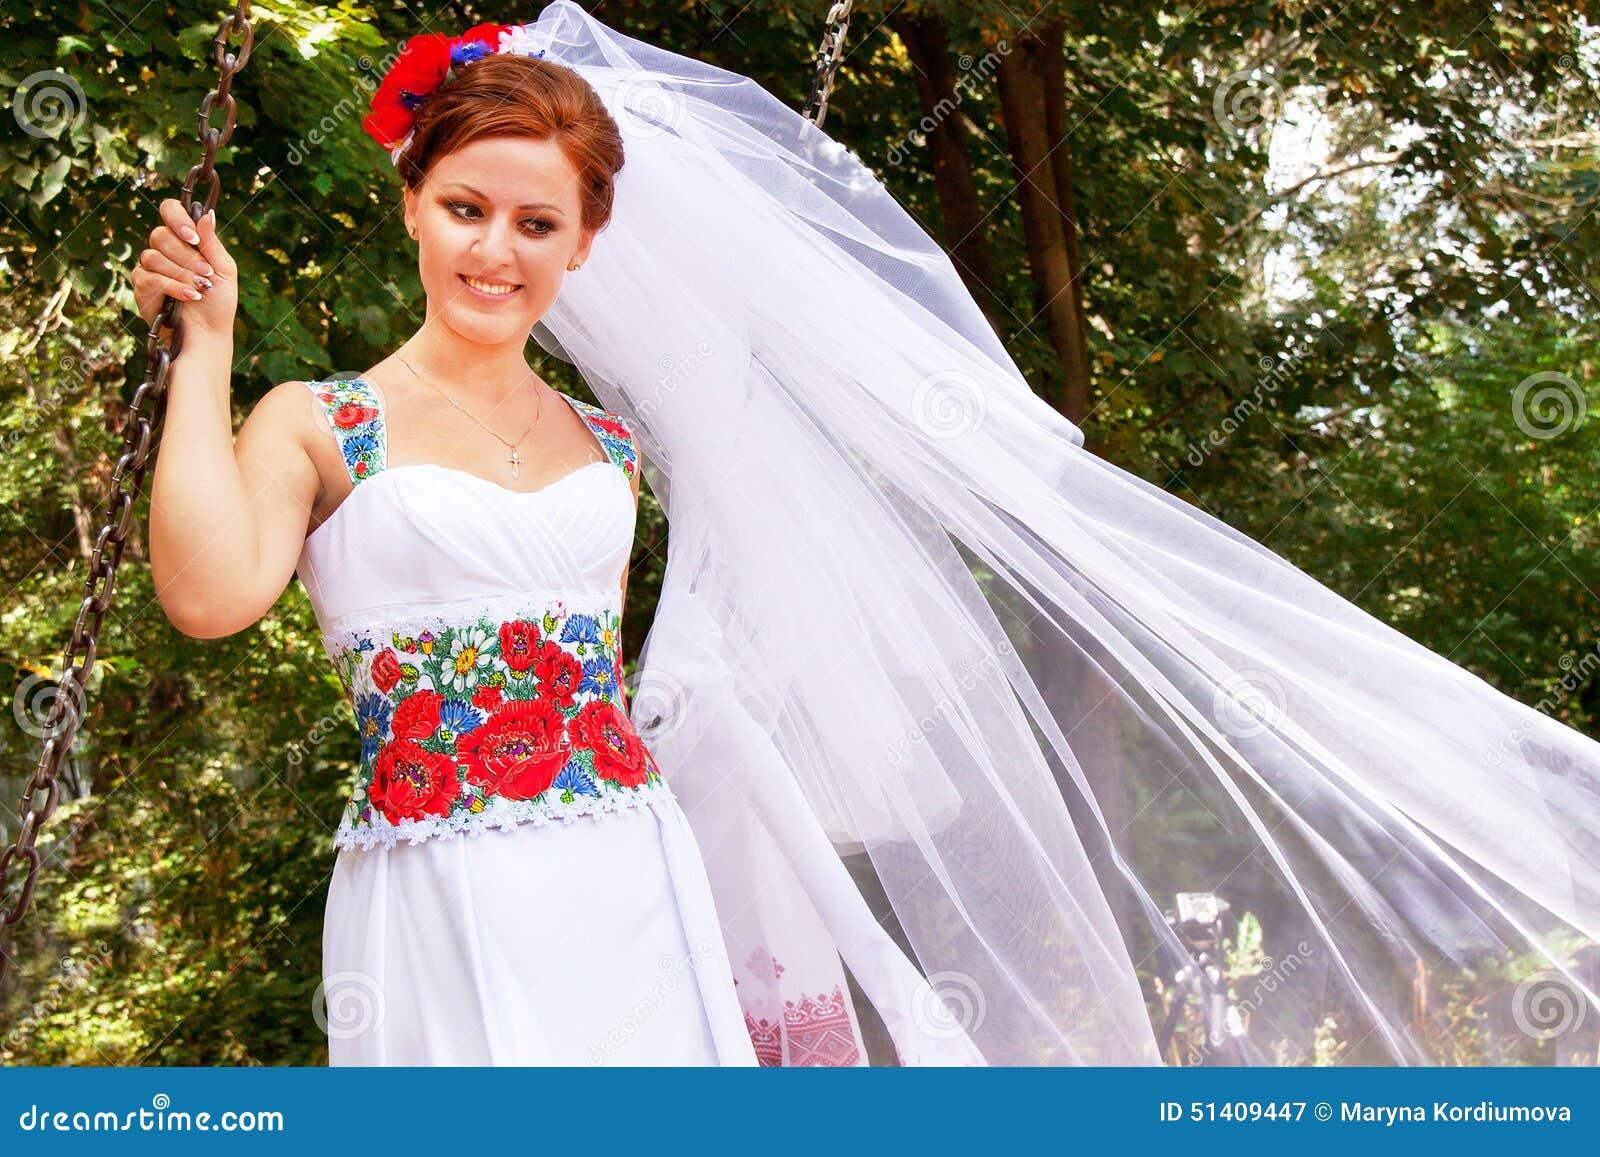 Apologise, Ukrainian bride be